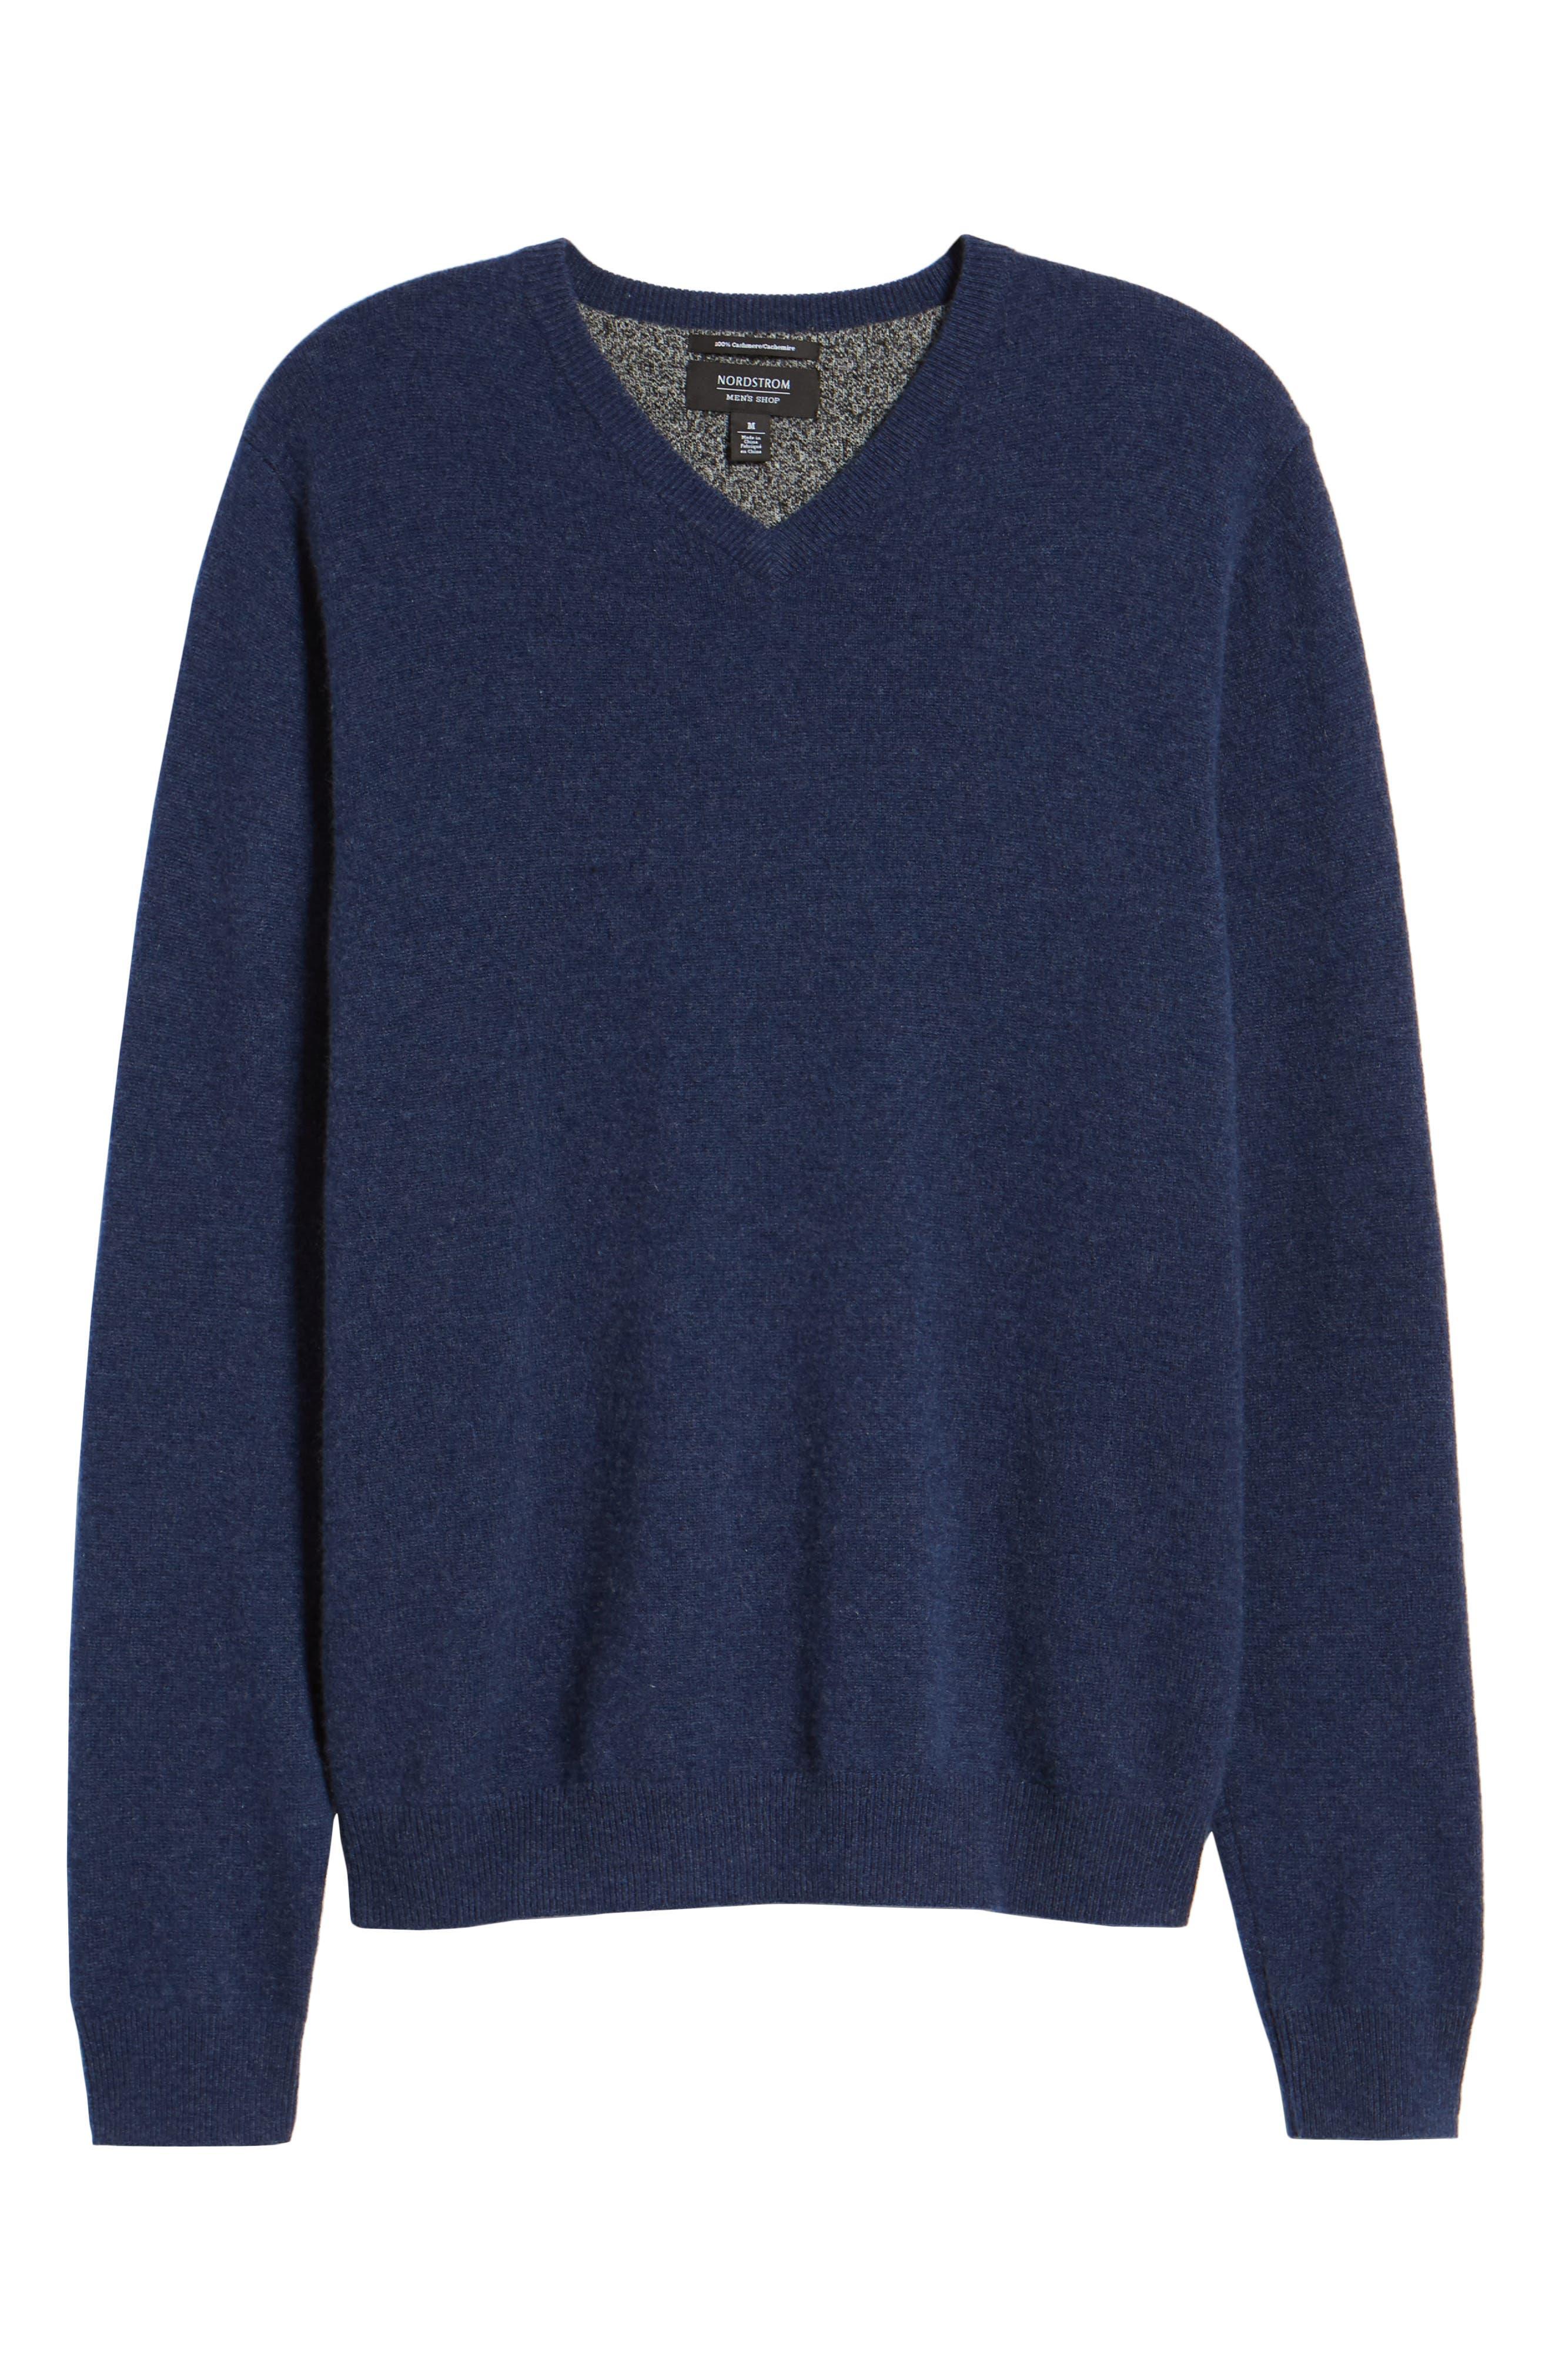 Cashmere V-Neck Sweater,                             Alternate thumbnail 6, color,                             BLUE ESTATE HEATHER